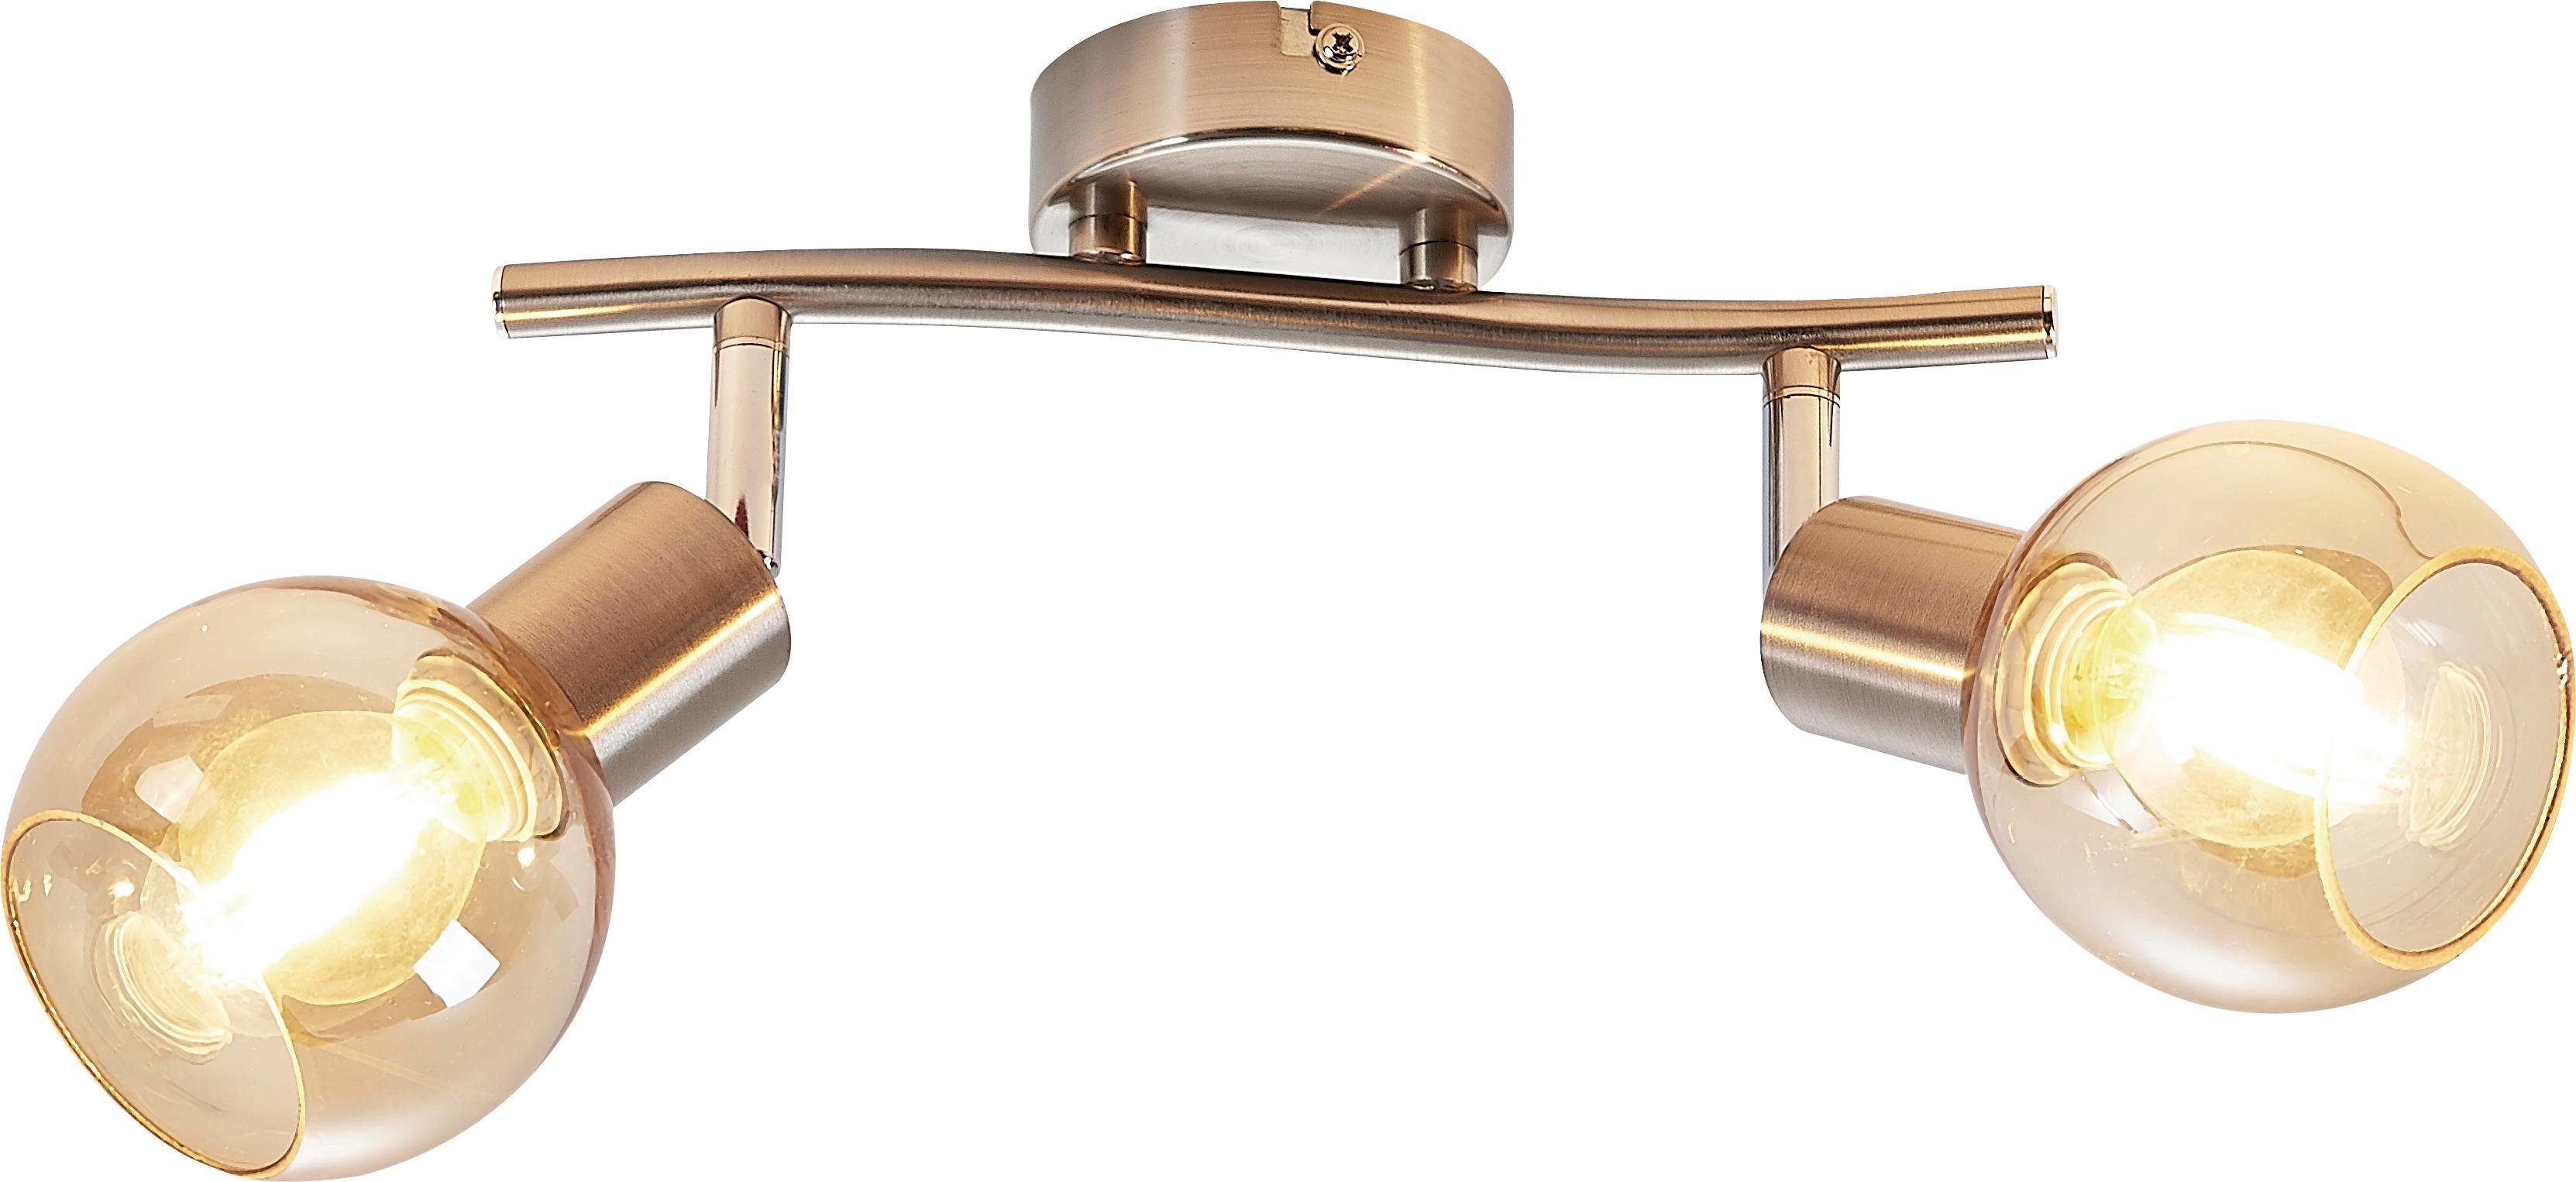 Nino Leuchten LED Deckenspot »CASTELLO«, 2-flammig